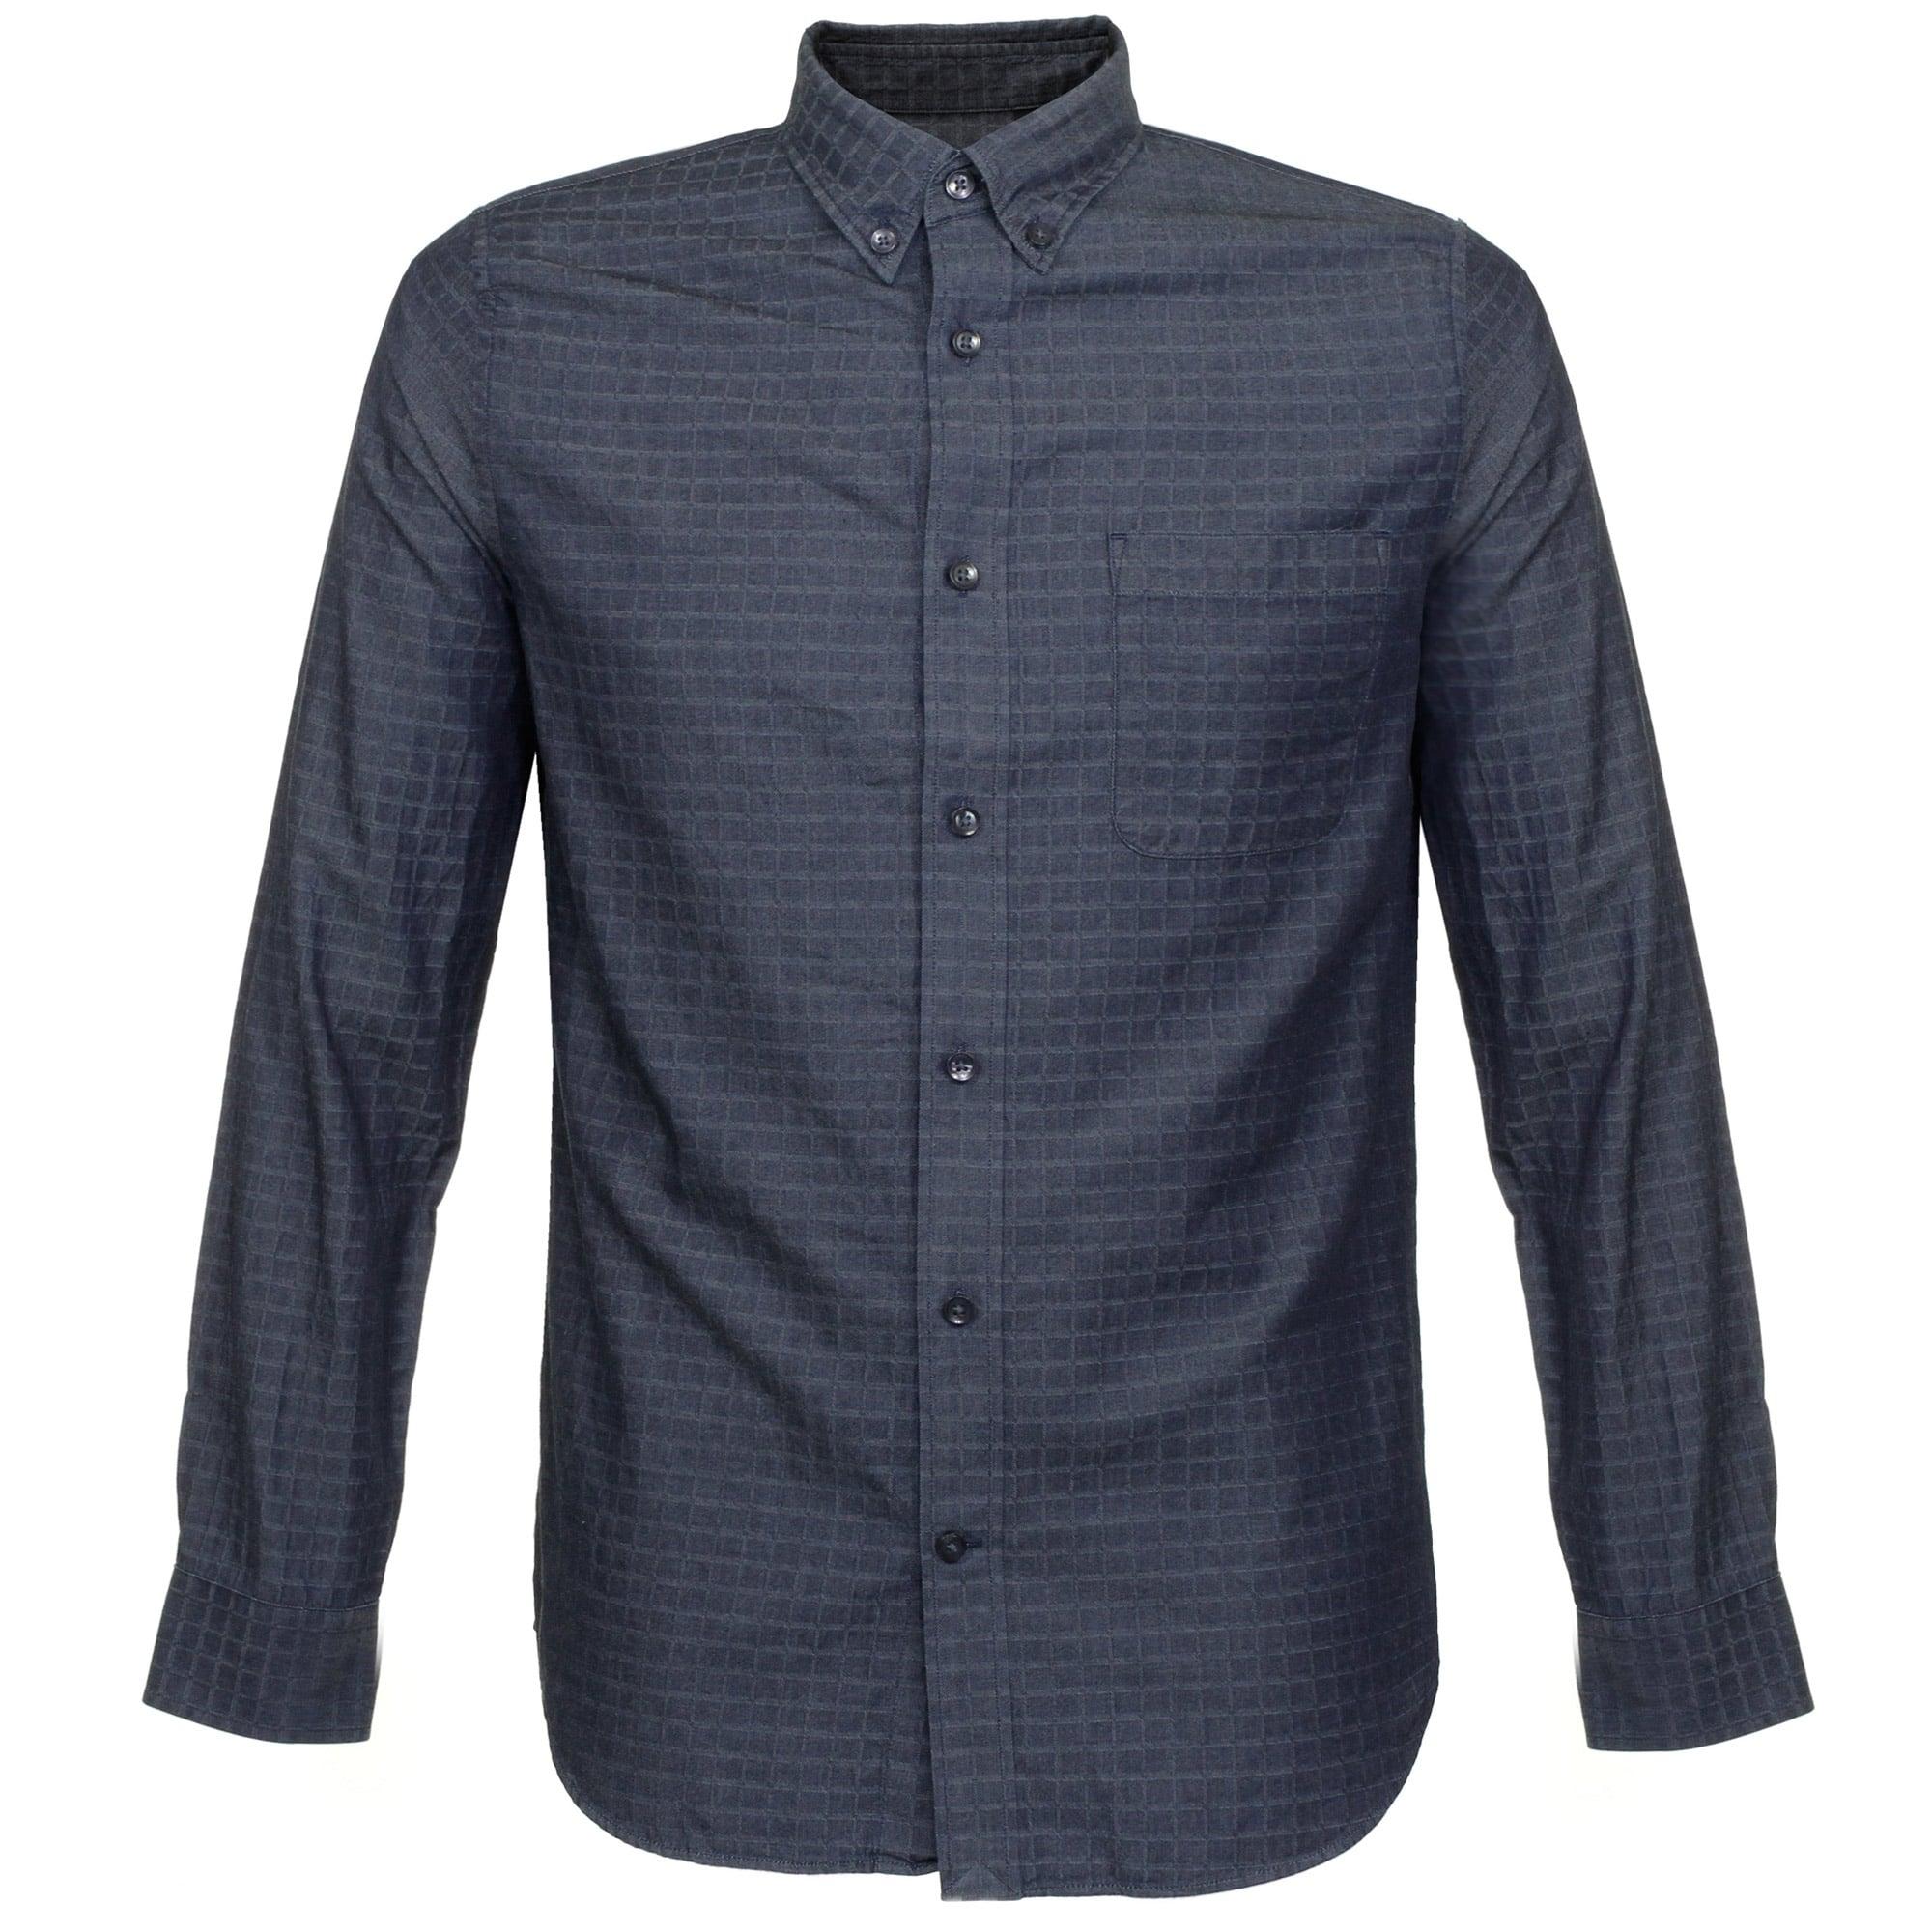 Matinique Trostol Check Dark navy Shirt 30201676